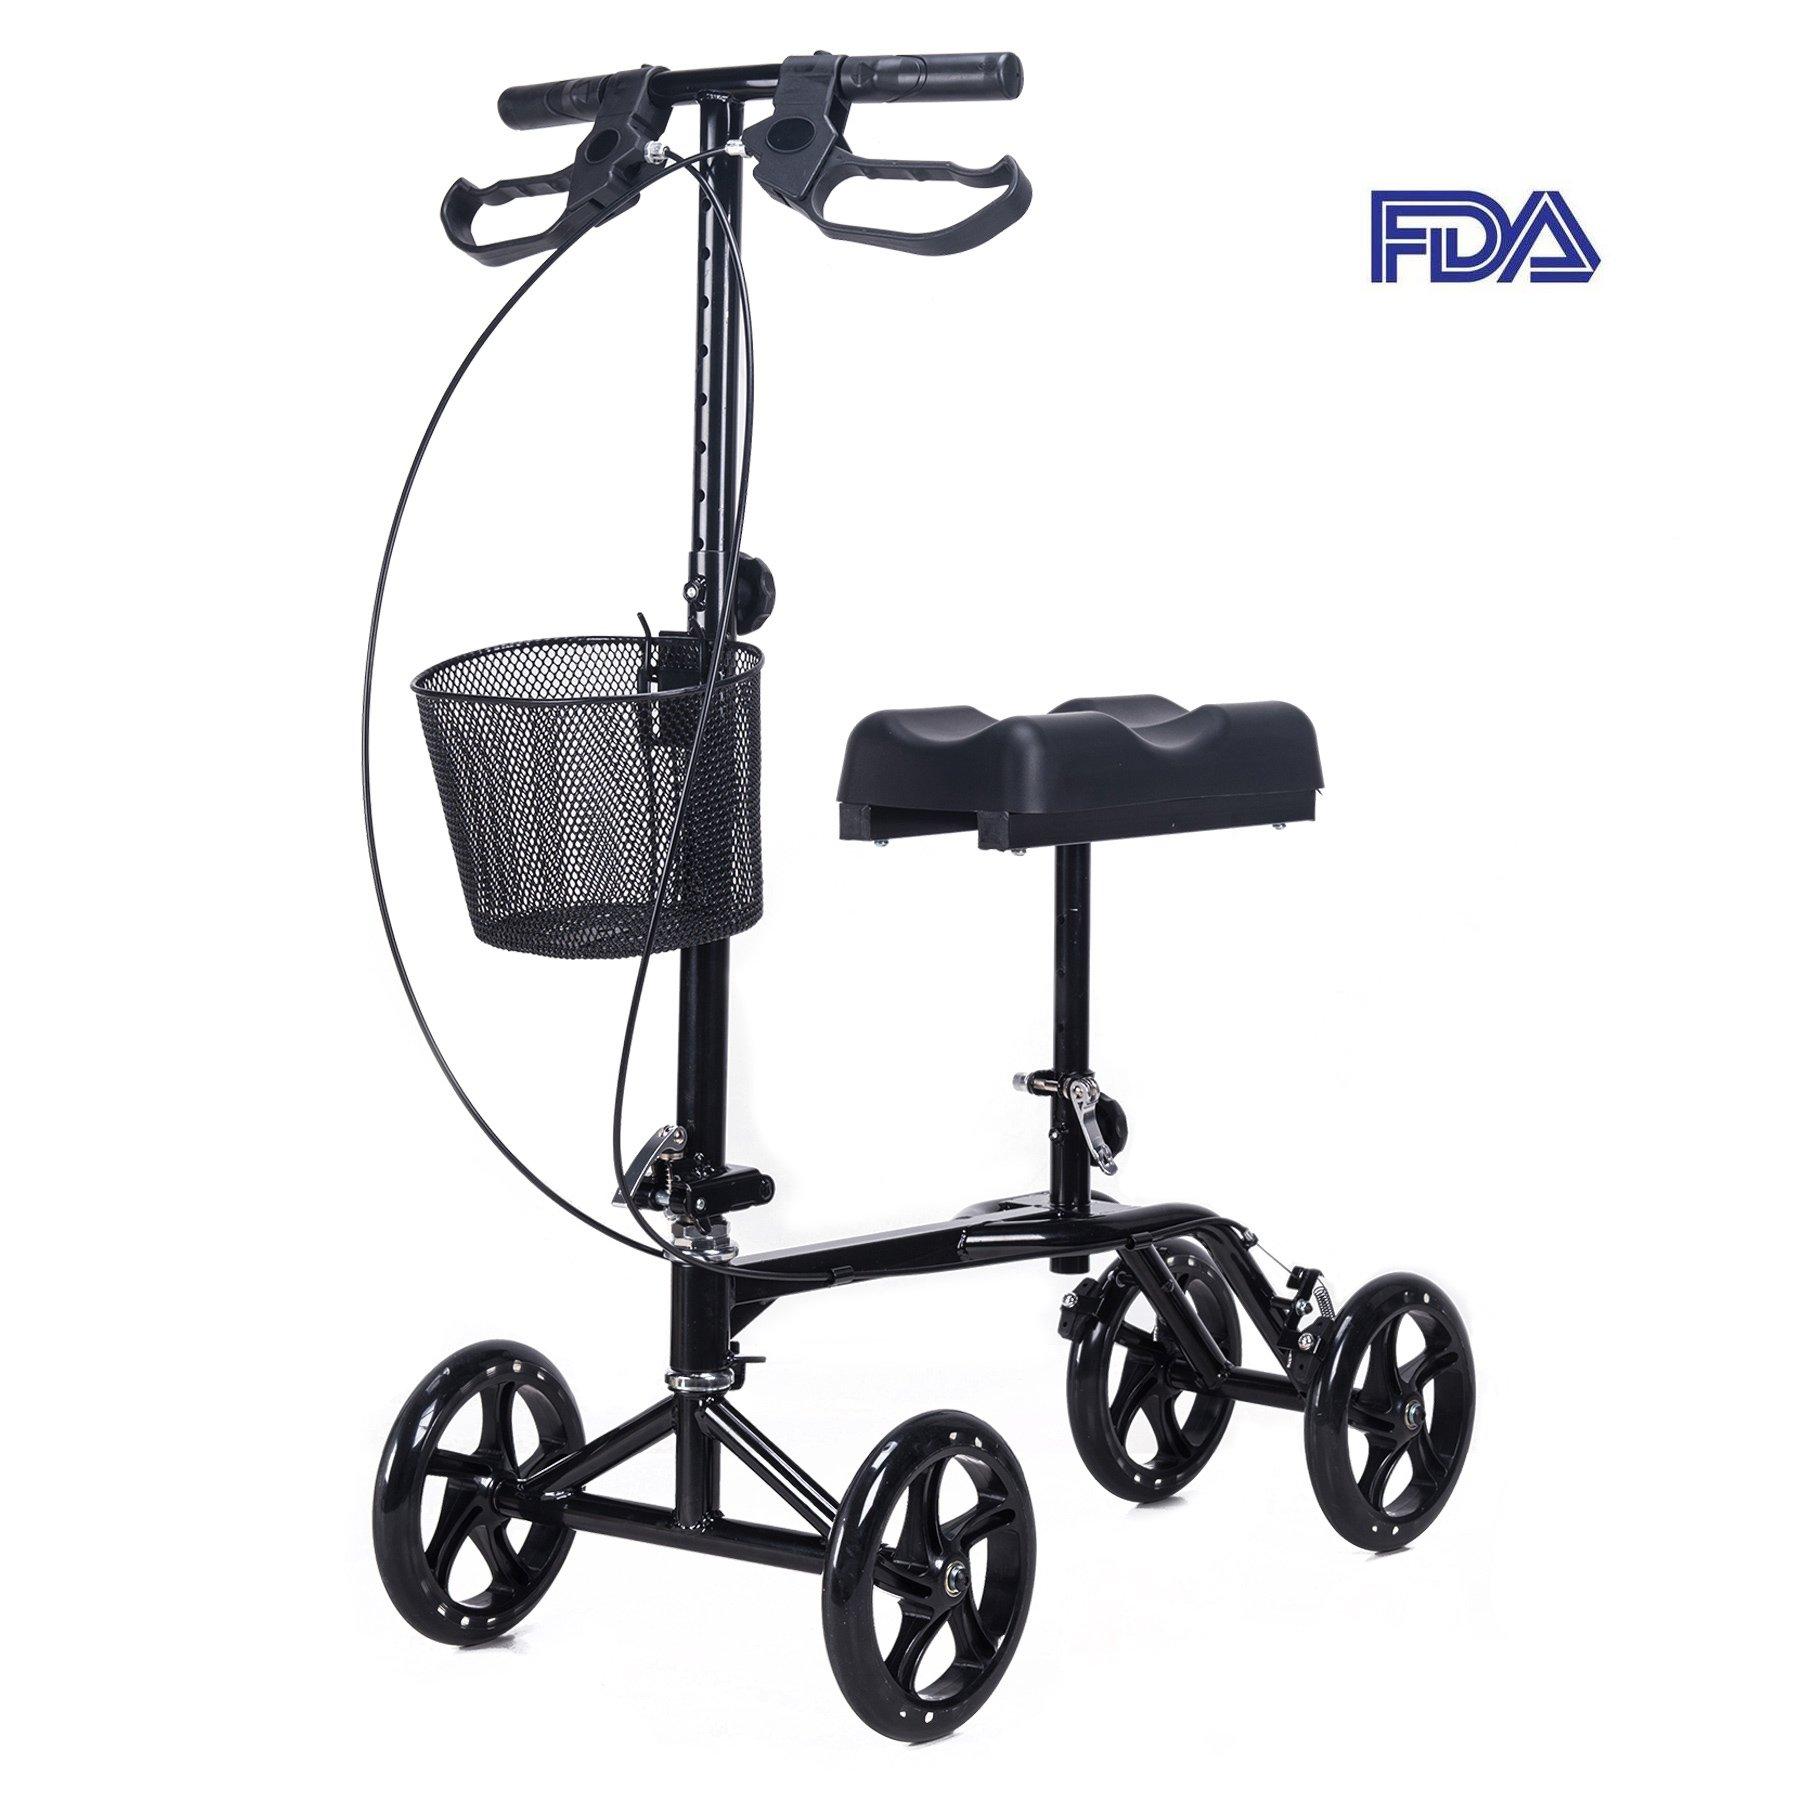 CO-Z Steerable Foldable Knee Walker Roller Scooter with Basket, 8'' Antiskid Rubber Wheels, Safety Double Brakes, Leg Walker Crutch (Black)